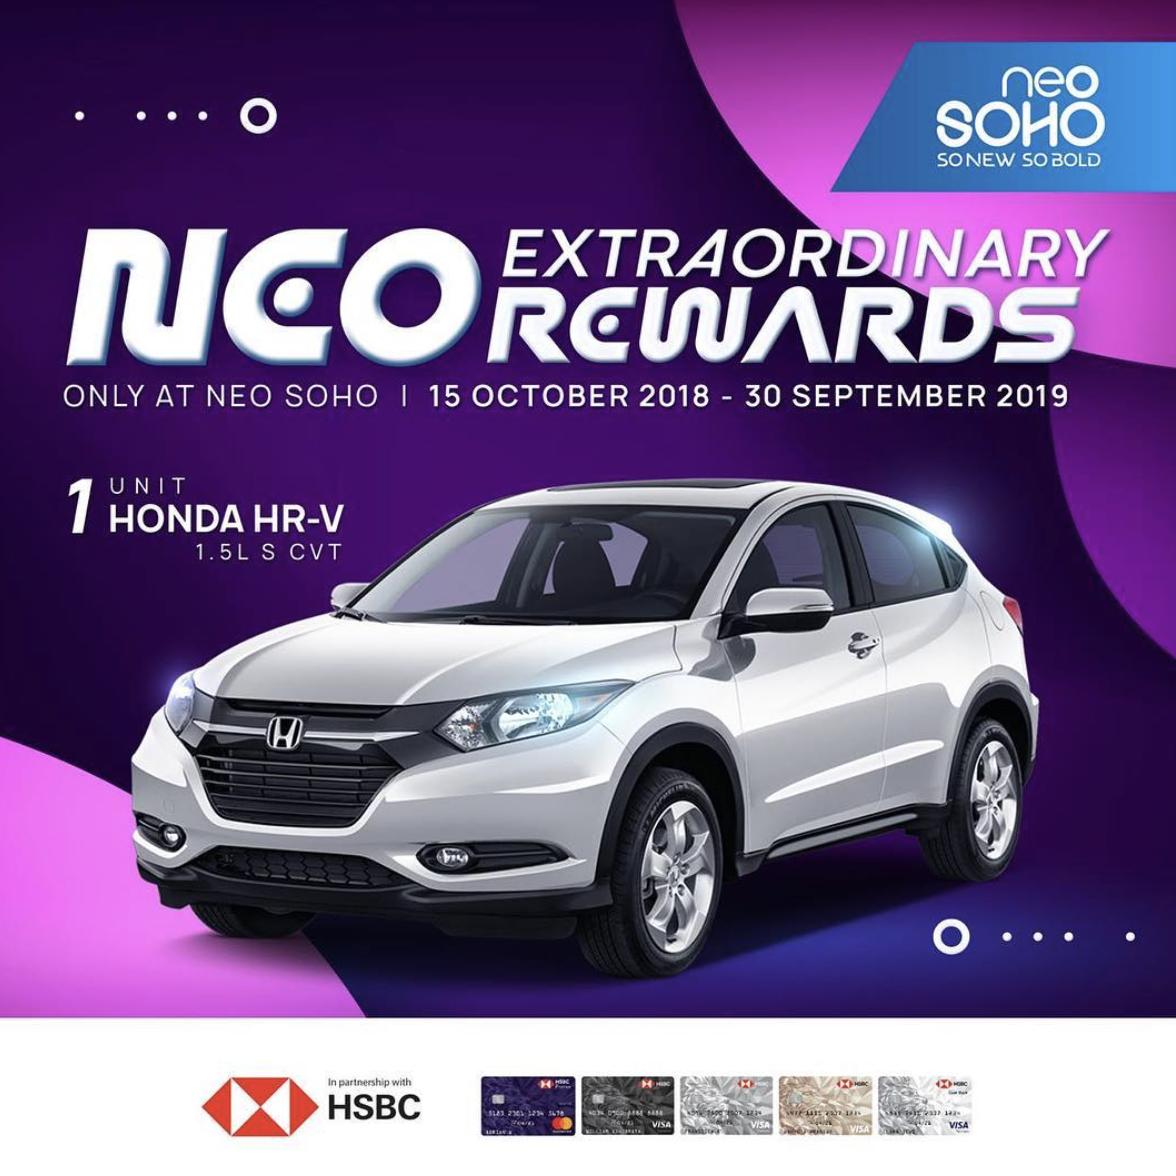 Neo Idr: NEO EXTRAORDINARY REWARDS 2018